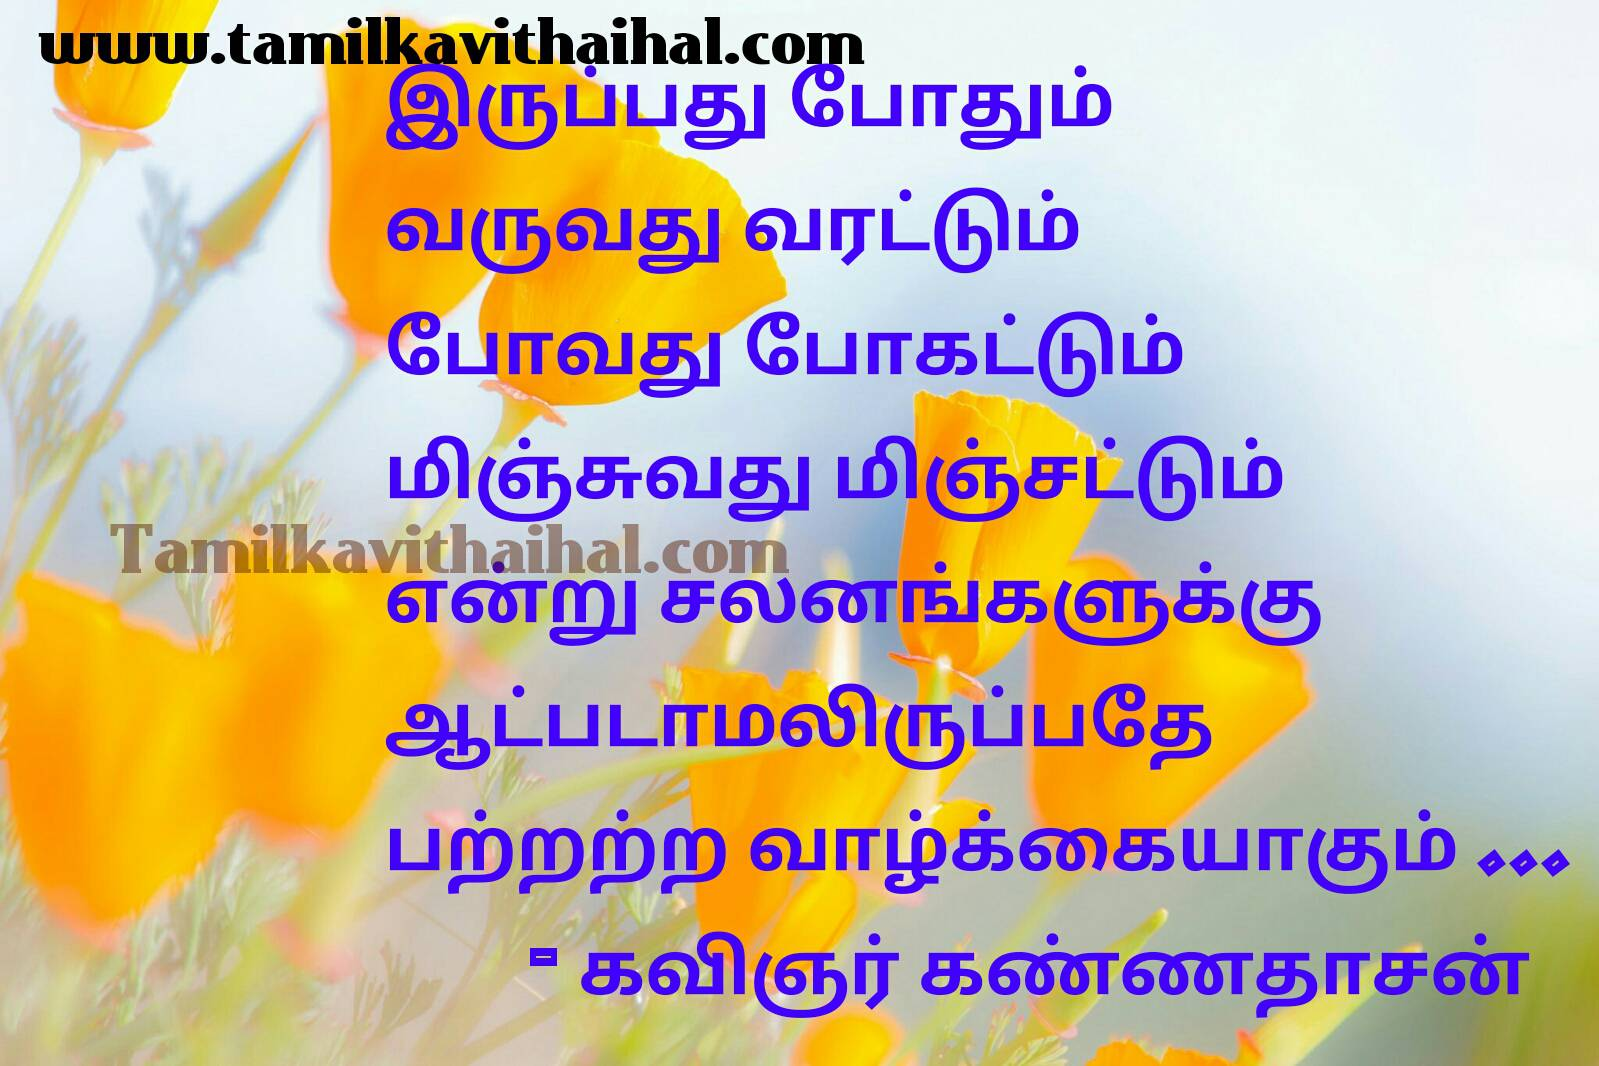 Best words for kaviarasu kannadasan kavithaigal thathuvam about life love future valkkai hd image download